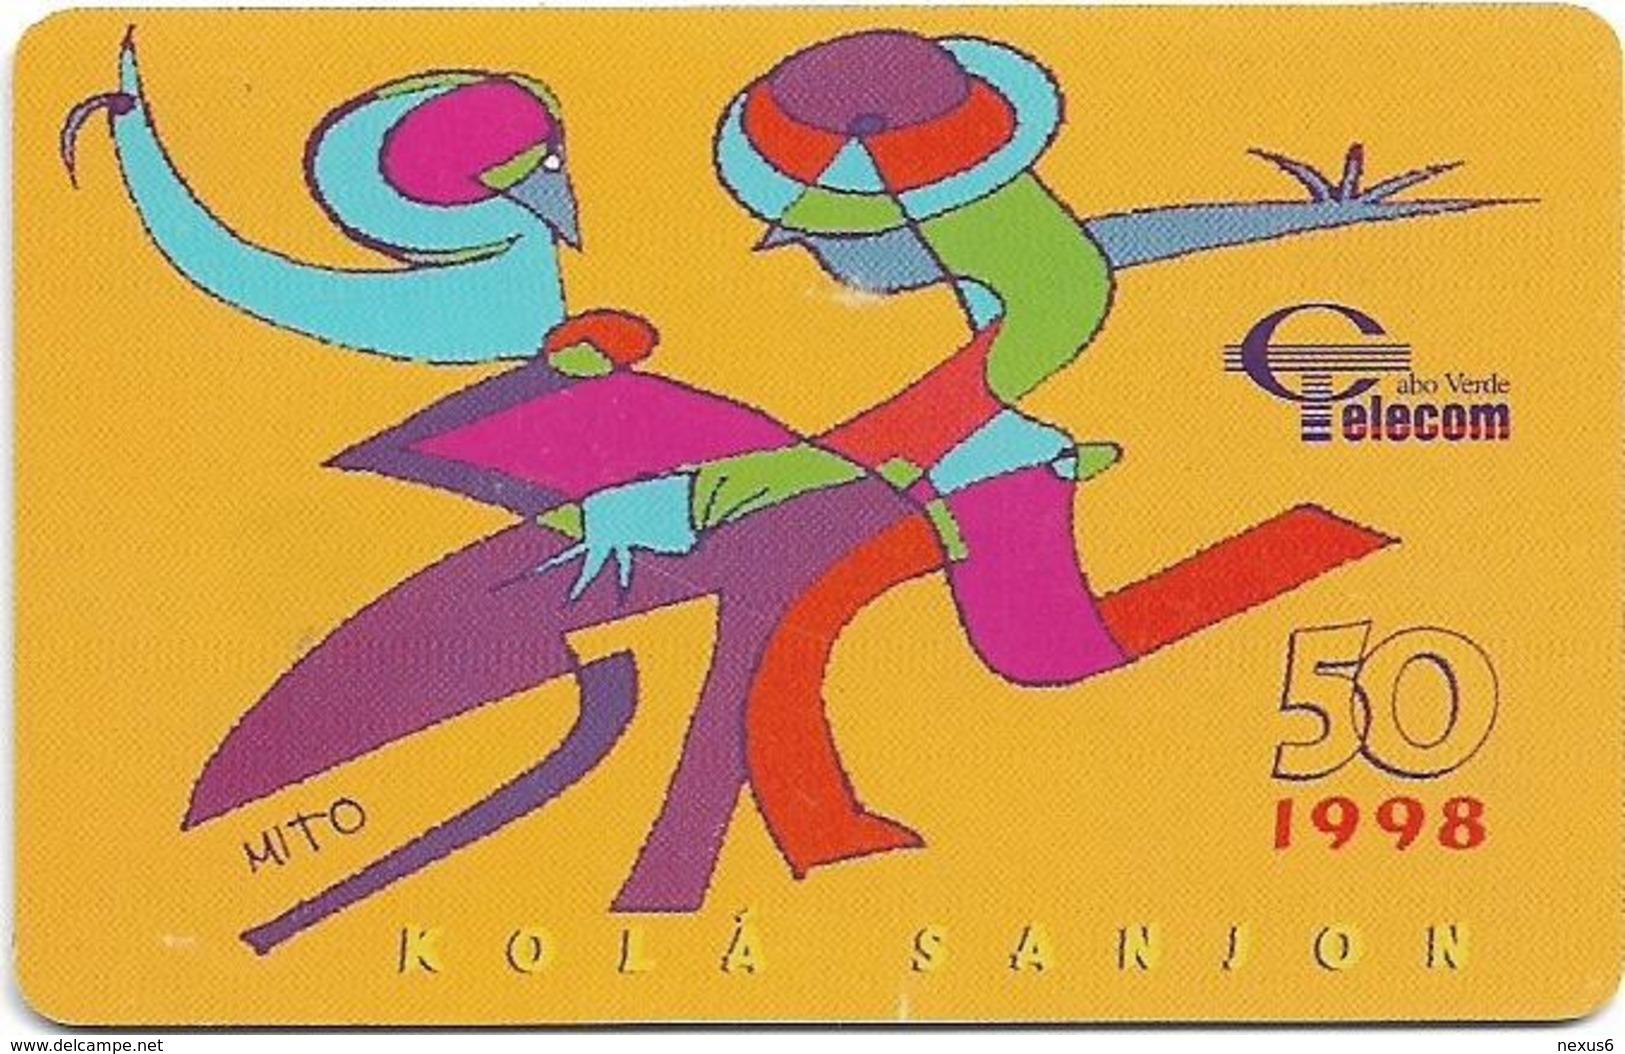 Cabo Verde - Cabo Verde Telecom - Kolá Sanjon, 50U, 1998, Used - Cap Vert